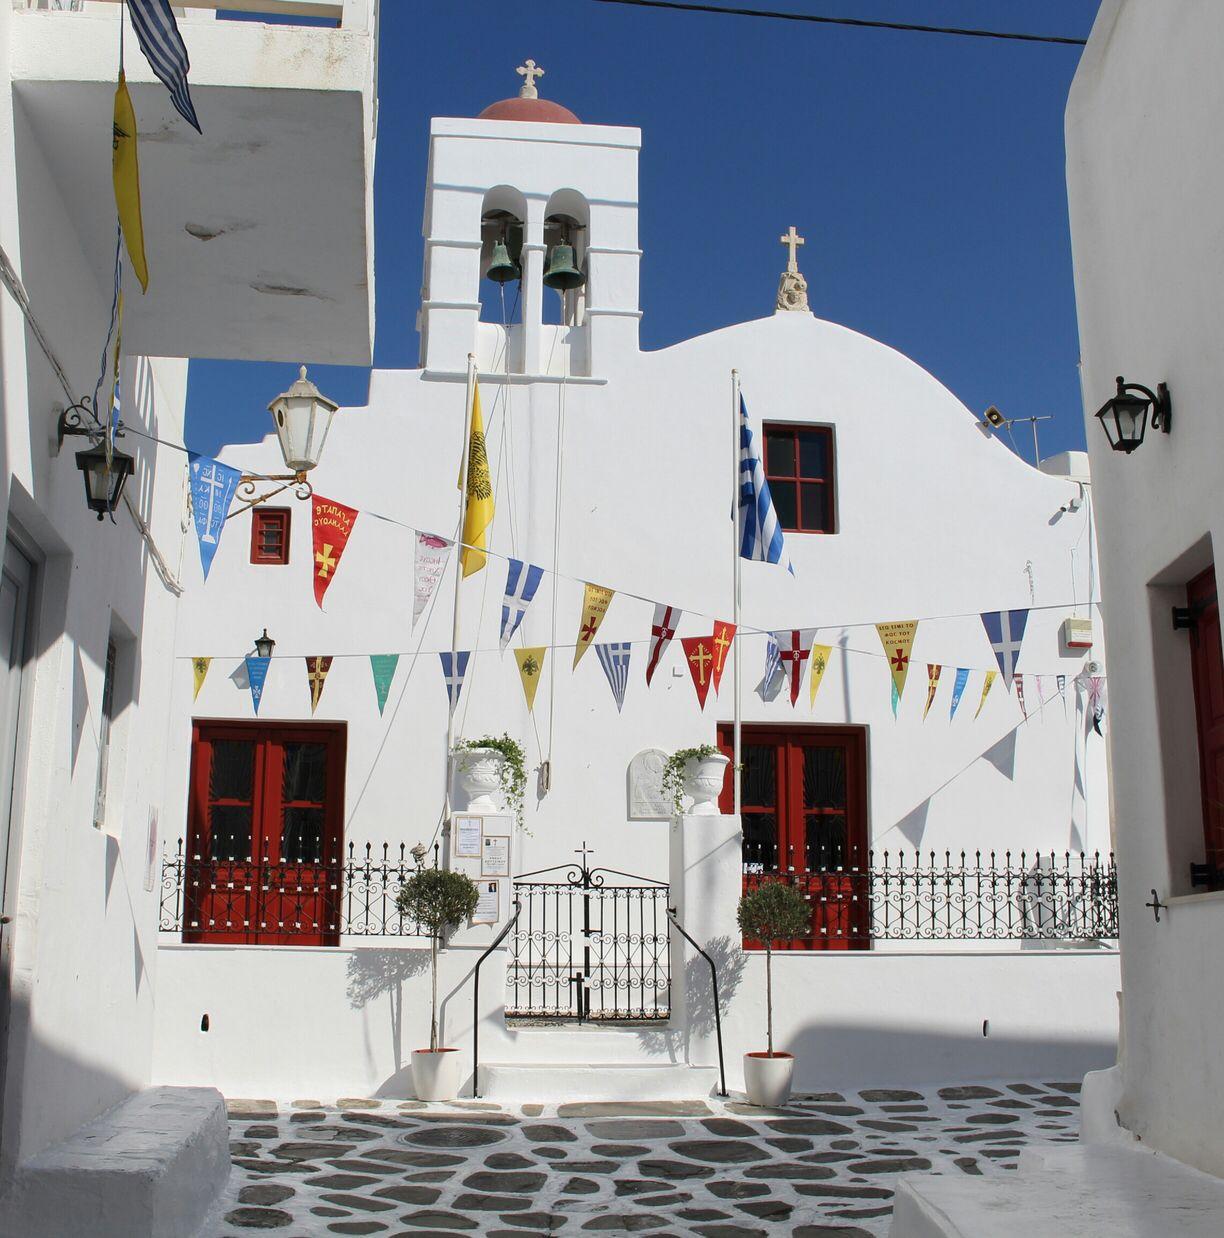 Mykonos, Greece, Mikonos, Greece - 🇬🇷 #colorful #flags #summer #mykonos #greece #wewhotravel #lifeatexpedia